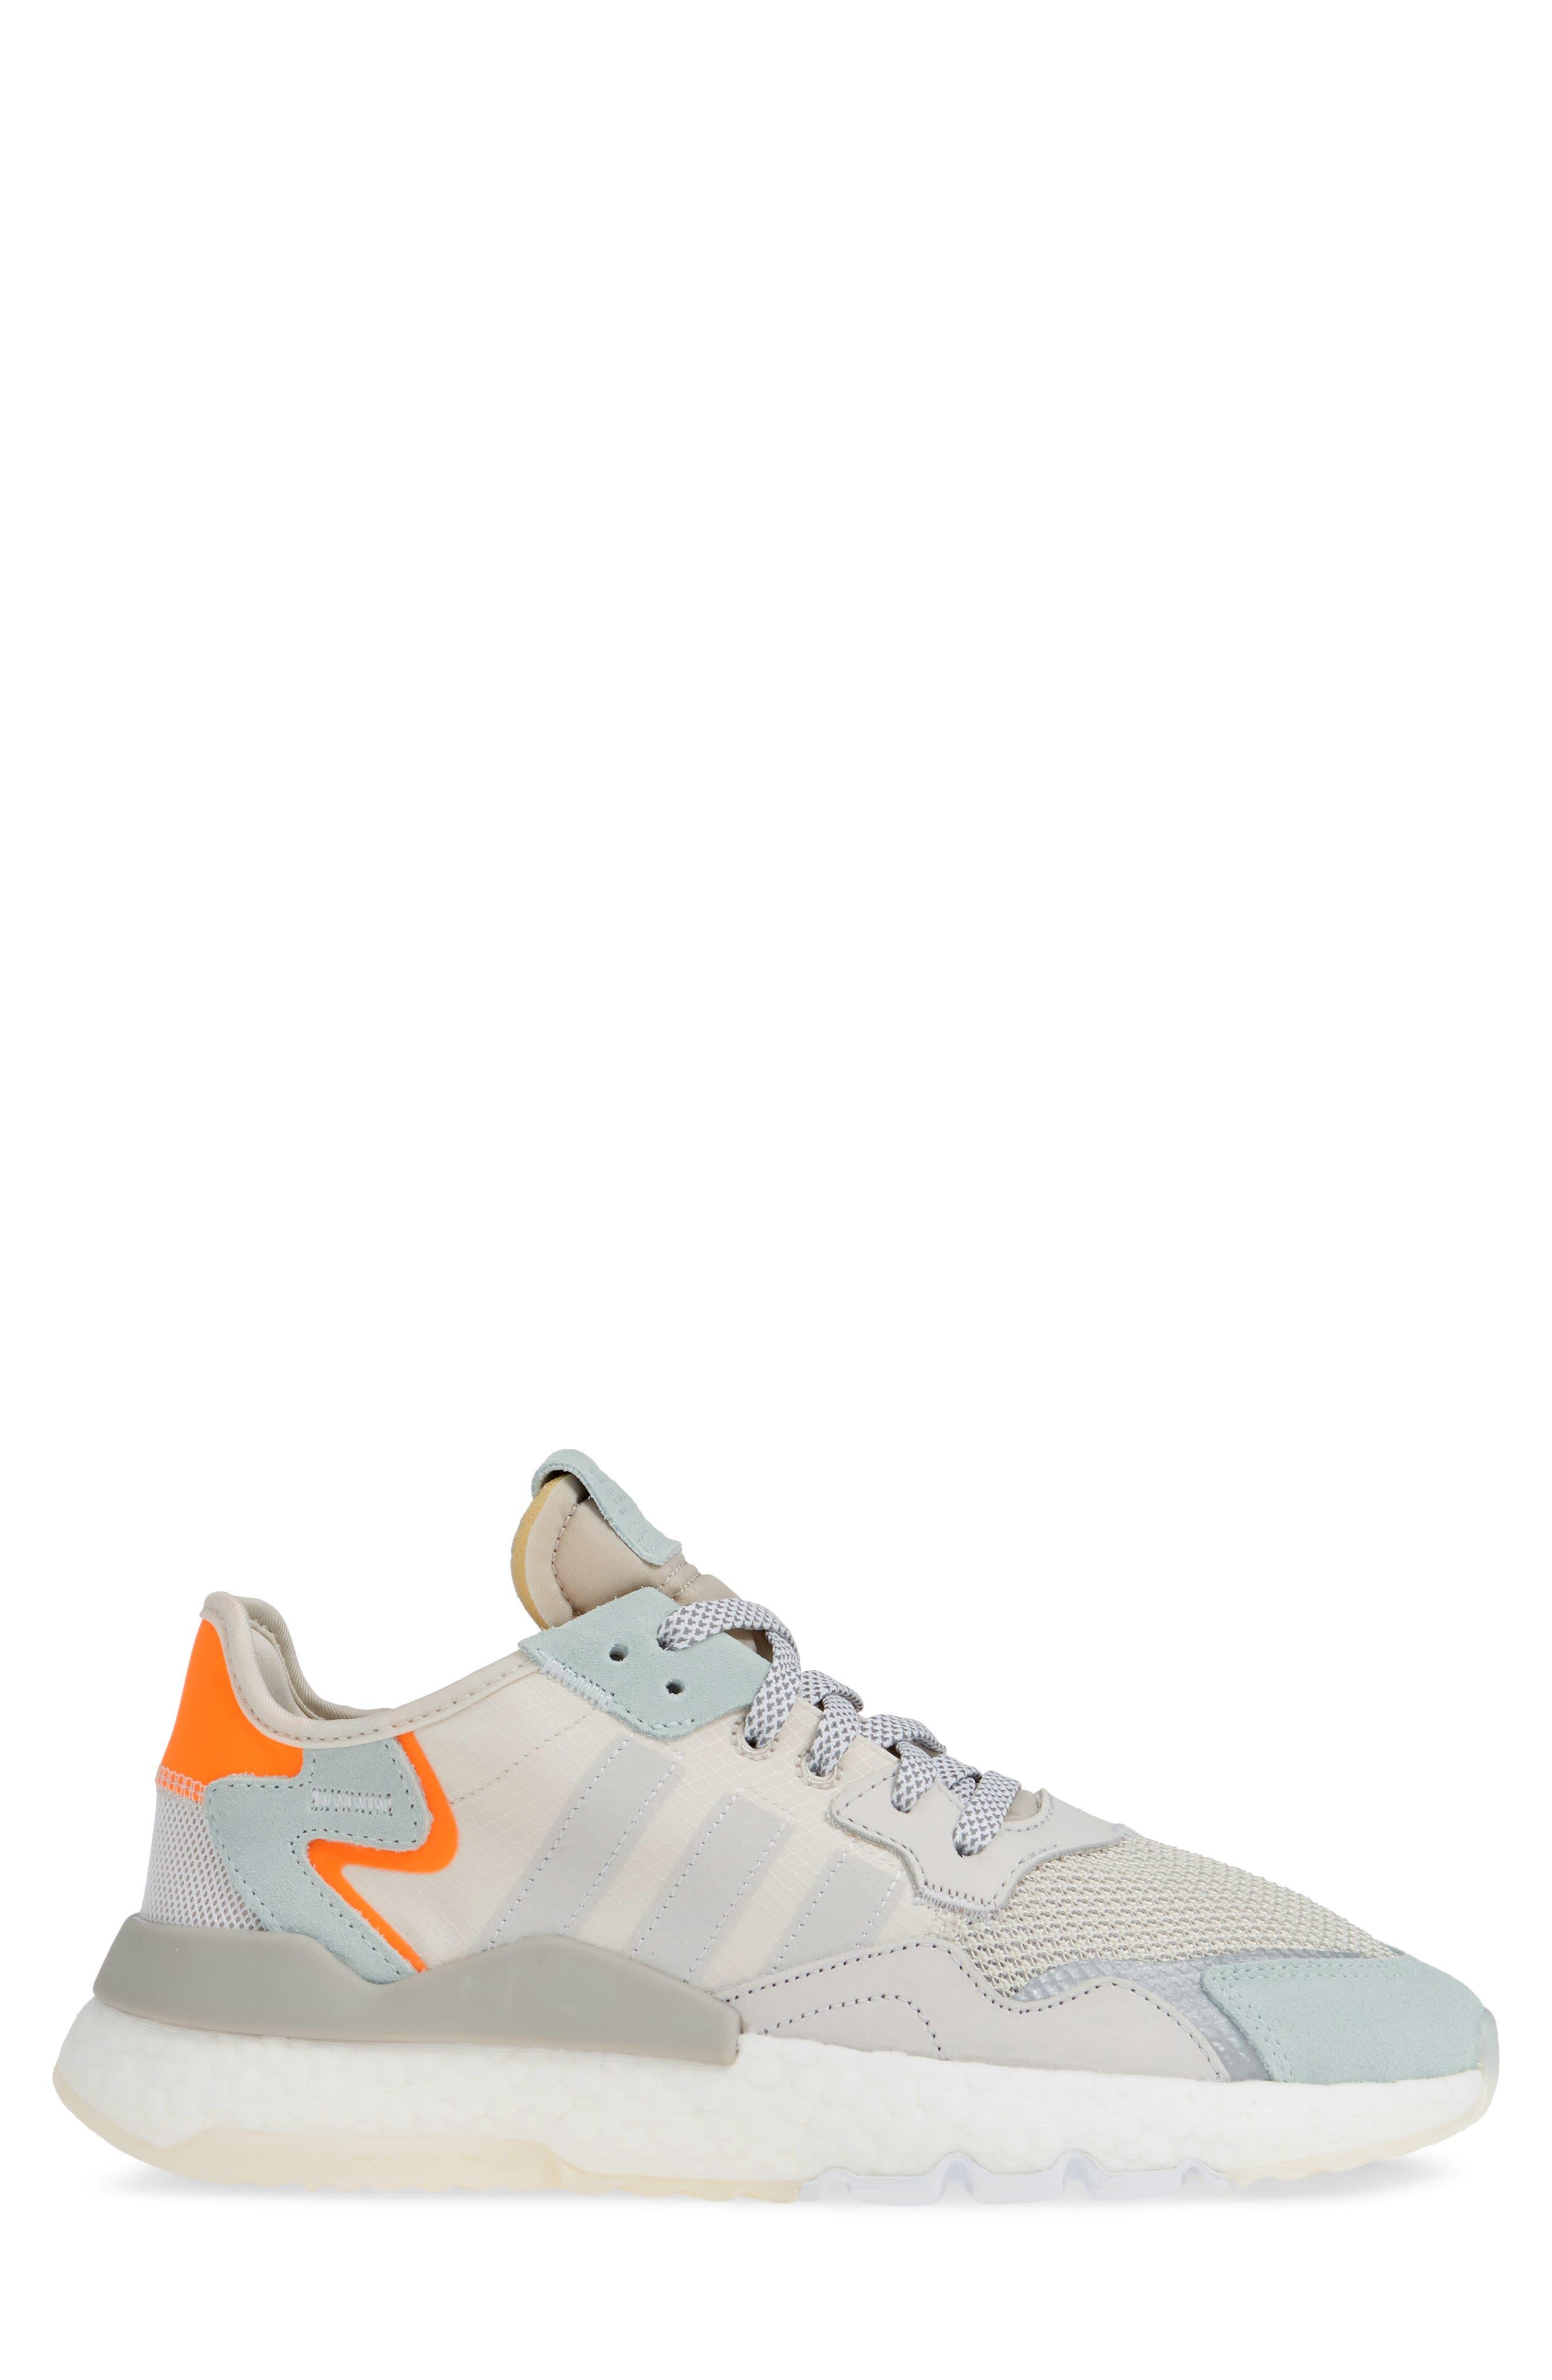 ADIDAS, Nite Jogger Sneaker, Alternate thumbnail 3, color, RAW WHITE/ GREY/ VAPOR GREEN